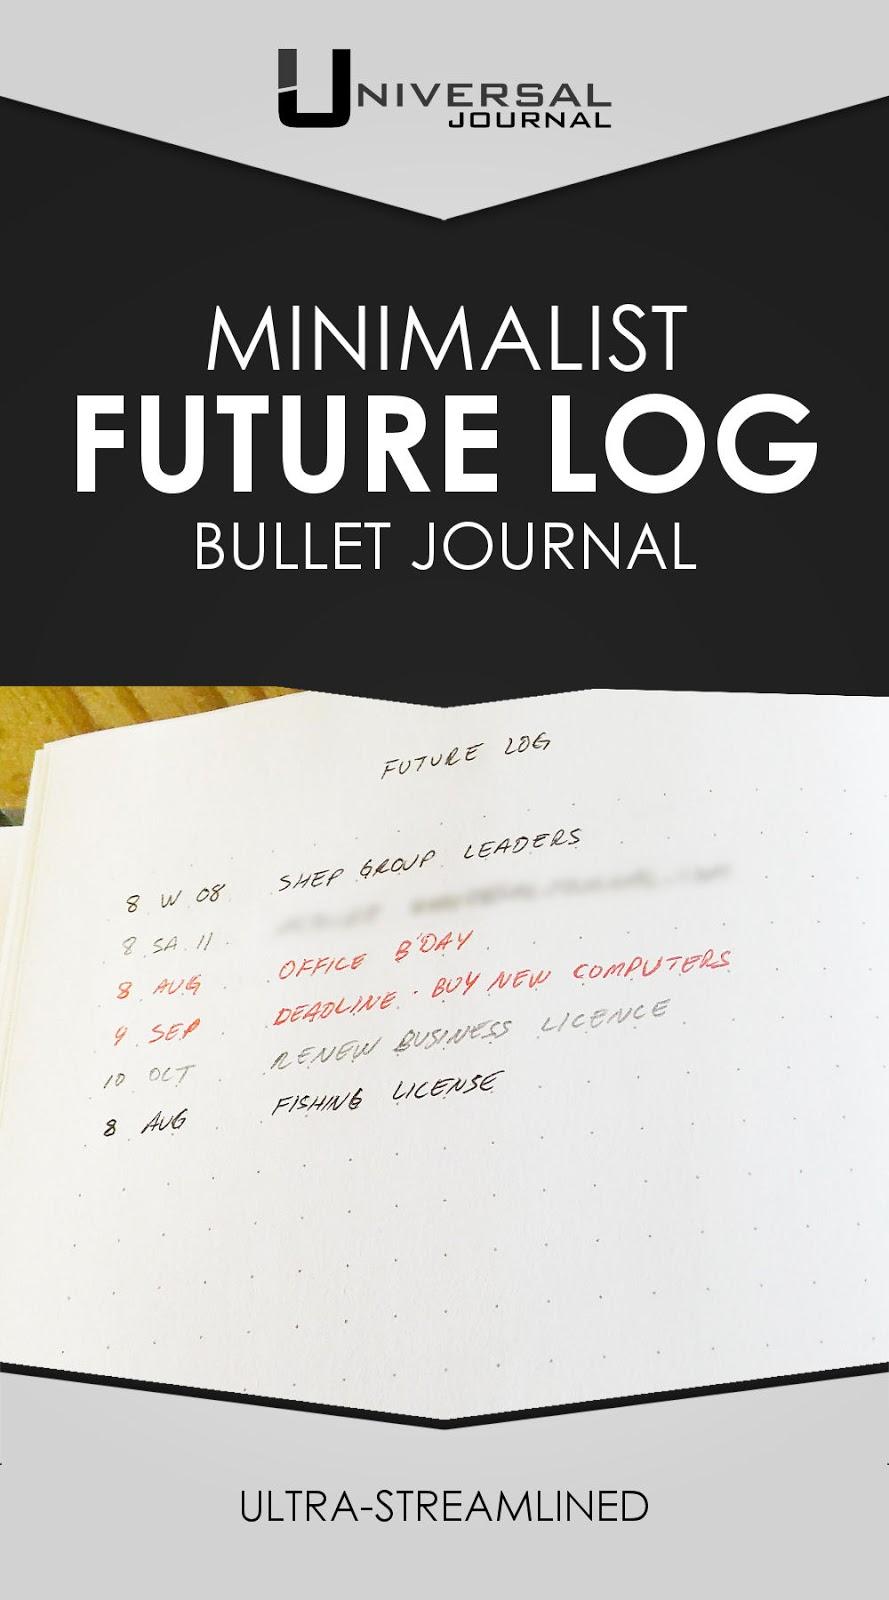 bullet journal minimalist future log